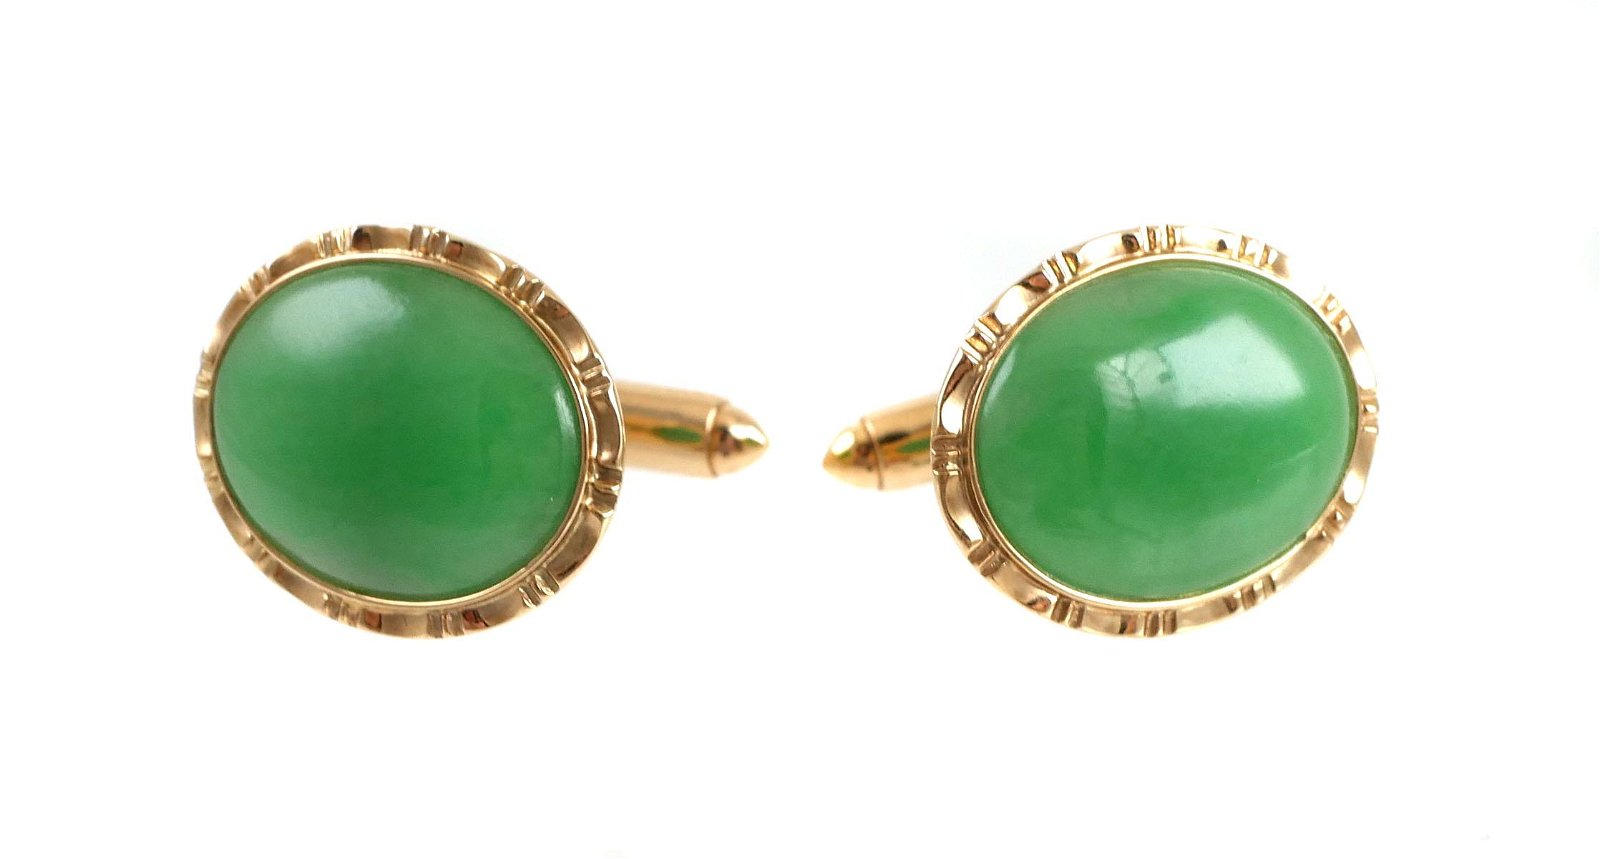 14k Gold Jade Cufflinks